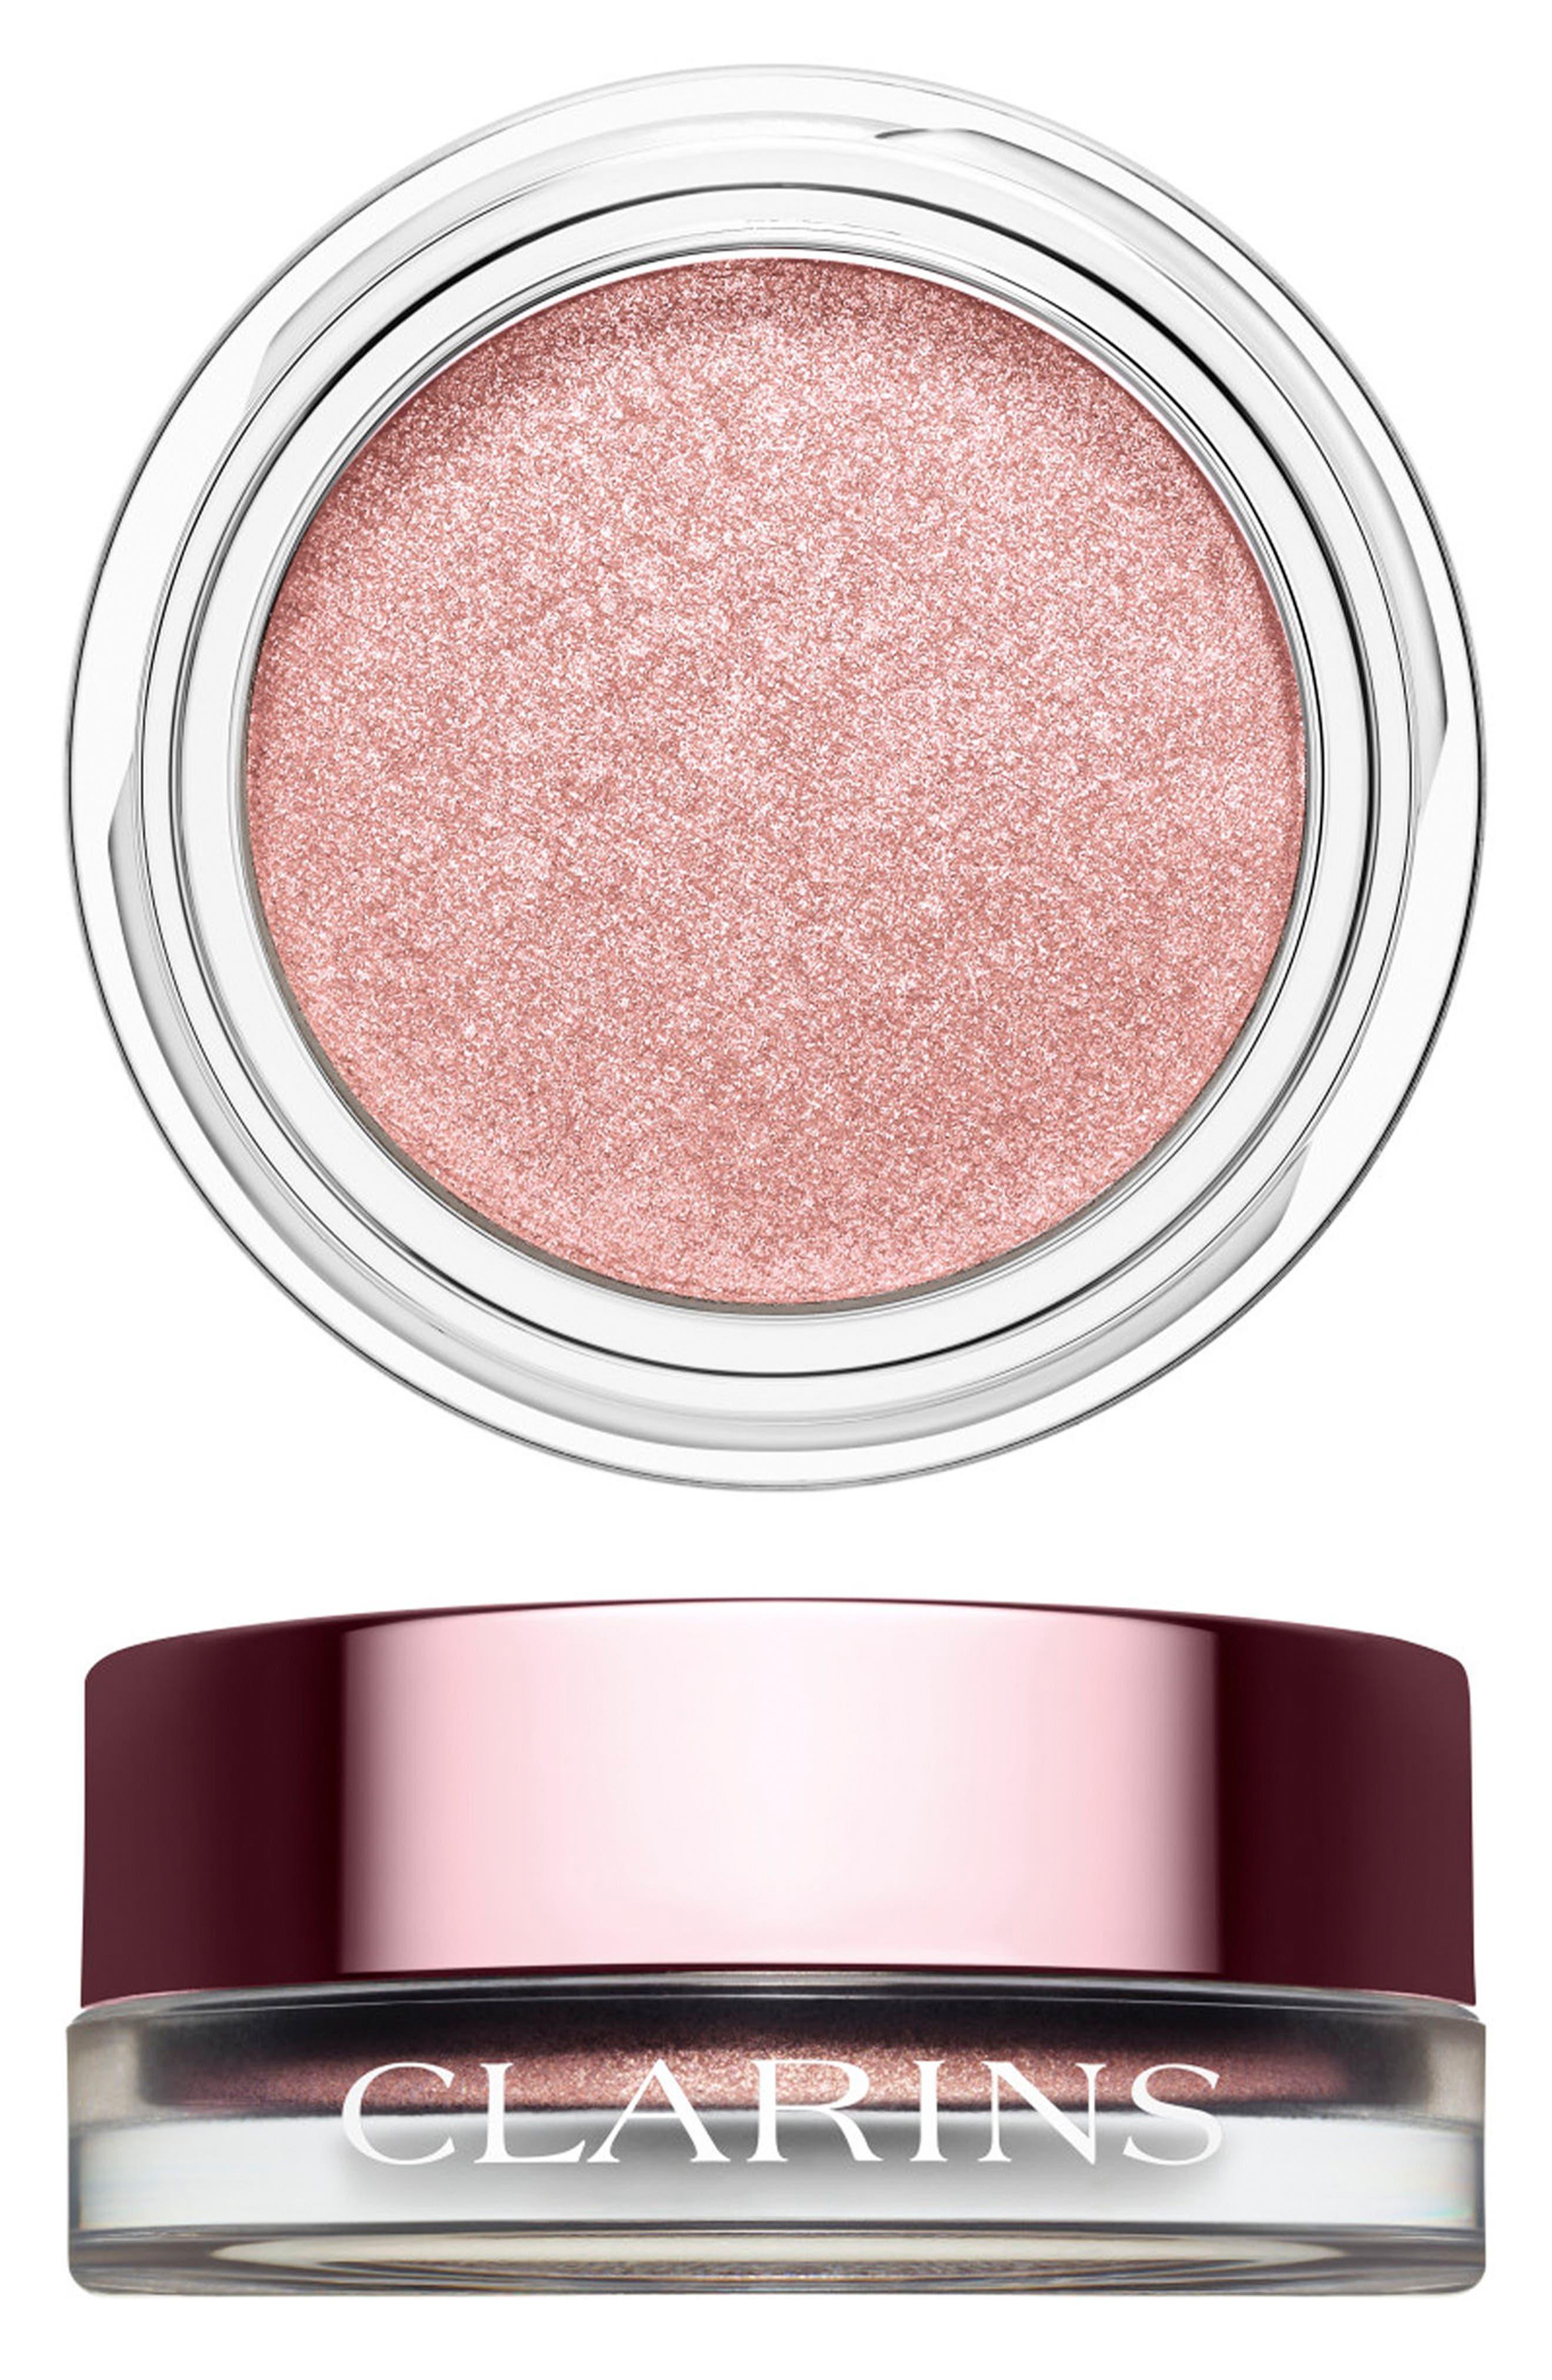 CLARINS Ombré Iridescente Cream-to-Powder Iridescent Eyeshadow, Main, color, SILVER ROSE 09